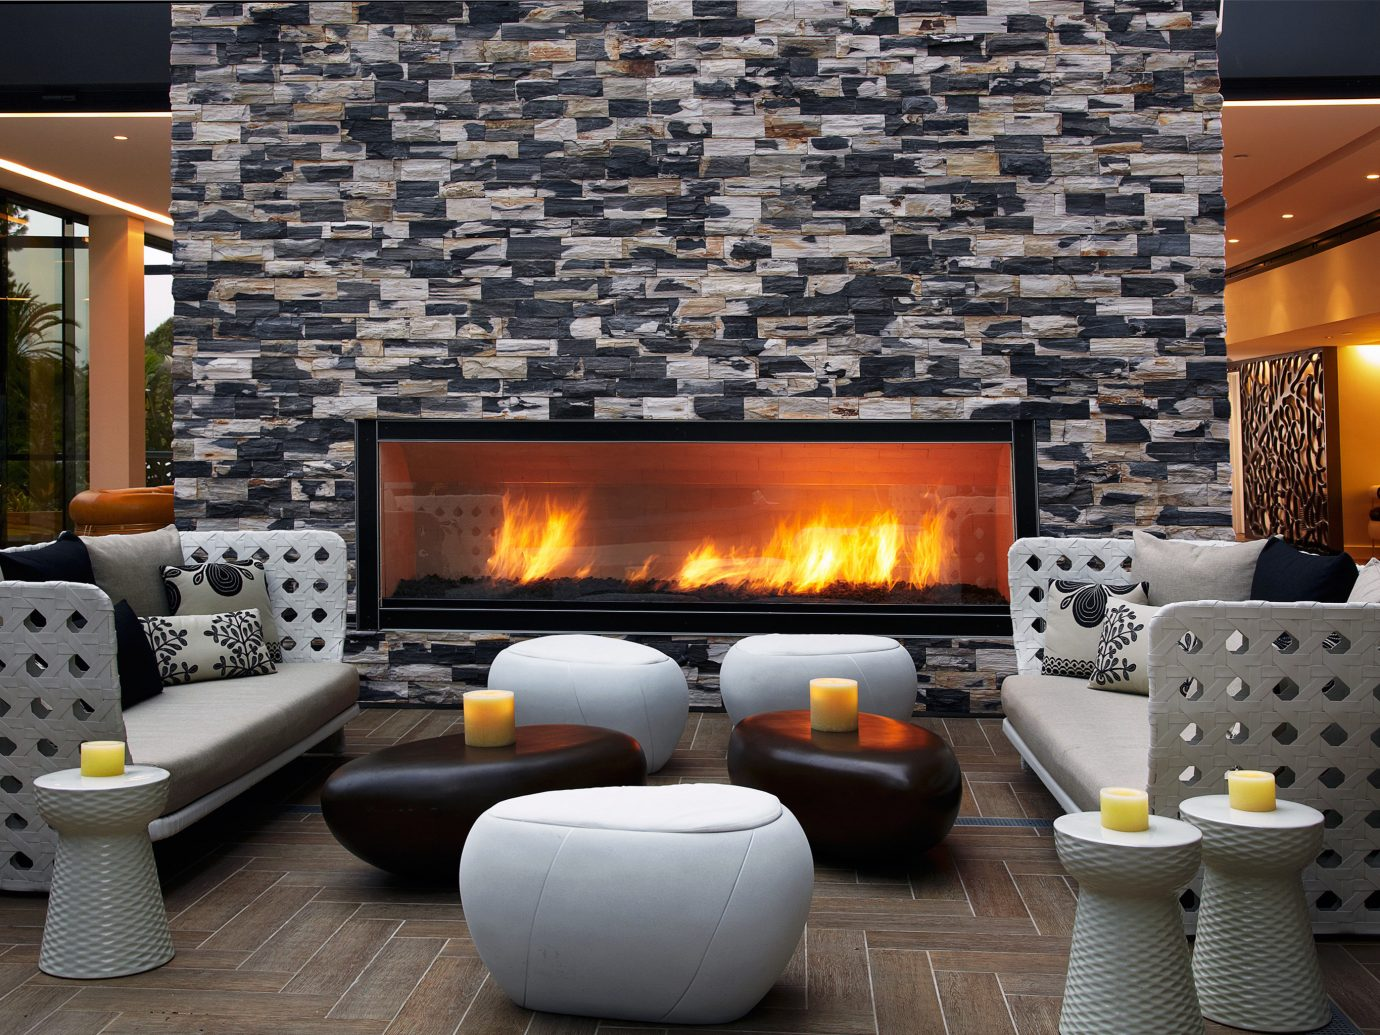 Fireplace Hip Hotels Lobby Lounge indoor Living hearth living room room wood burning stove home interior design floor Design cottage real estate furniture stone